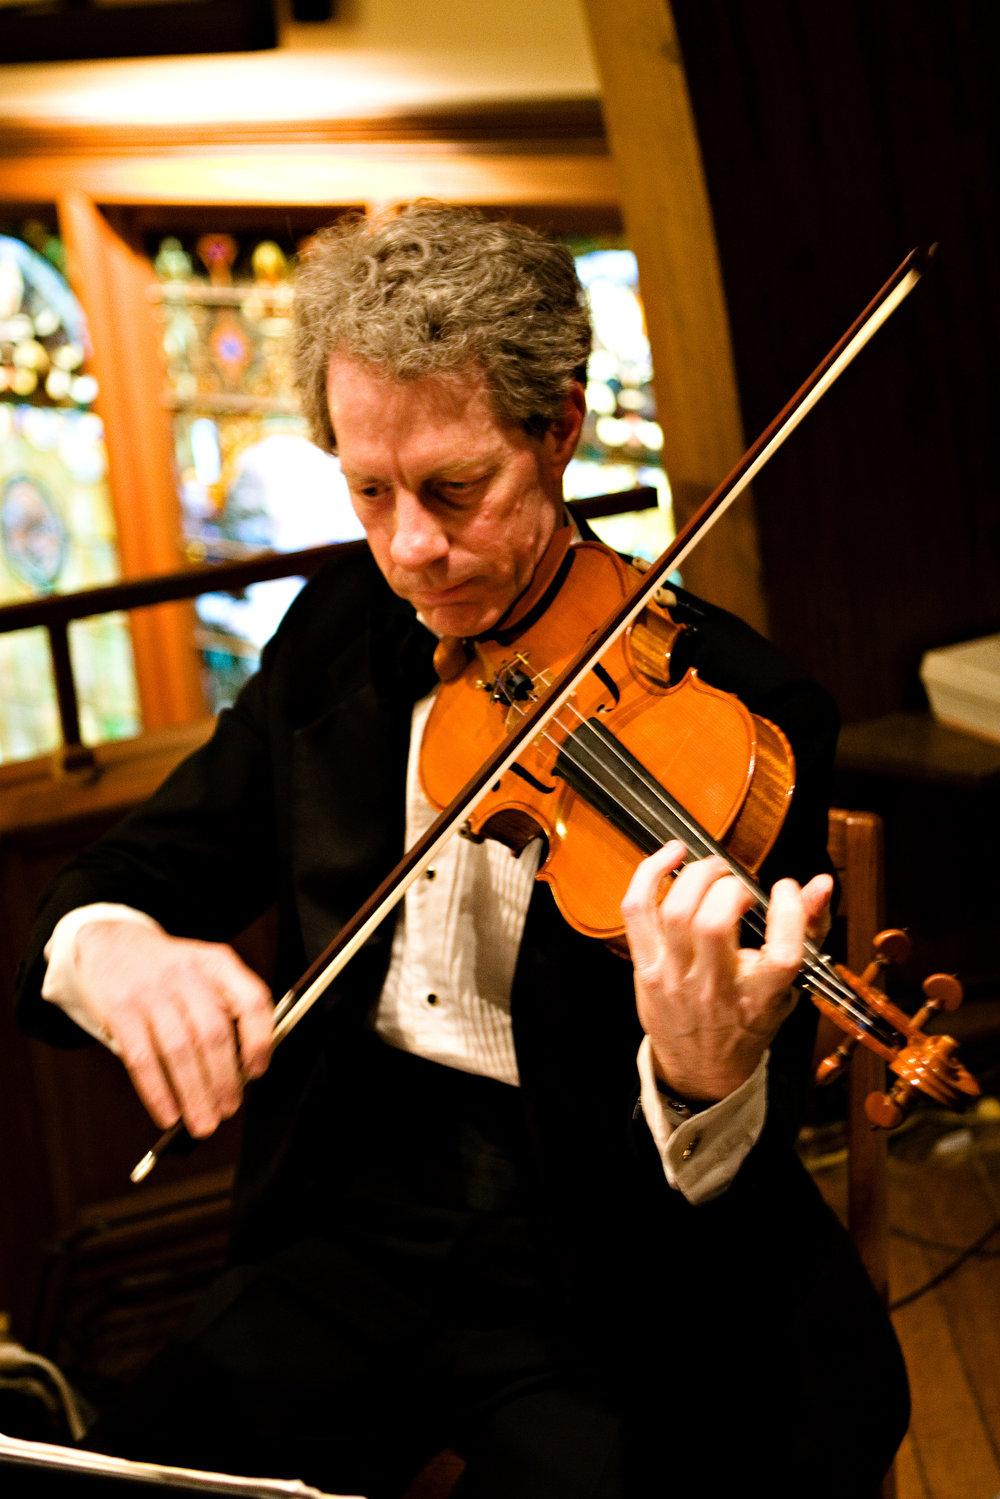 Violin at wedding 2.jpg